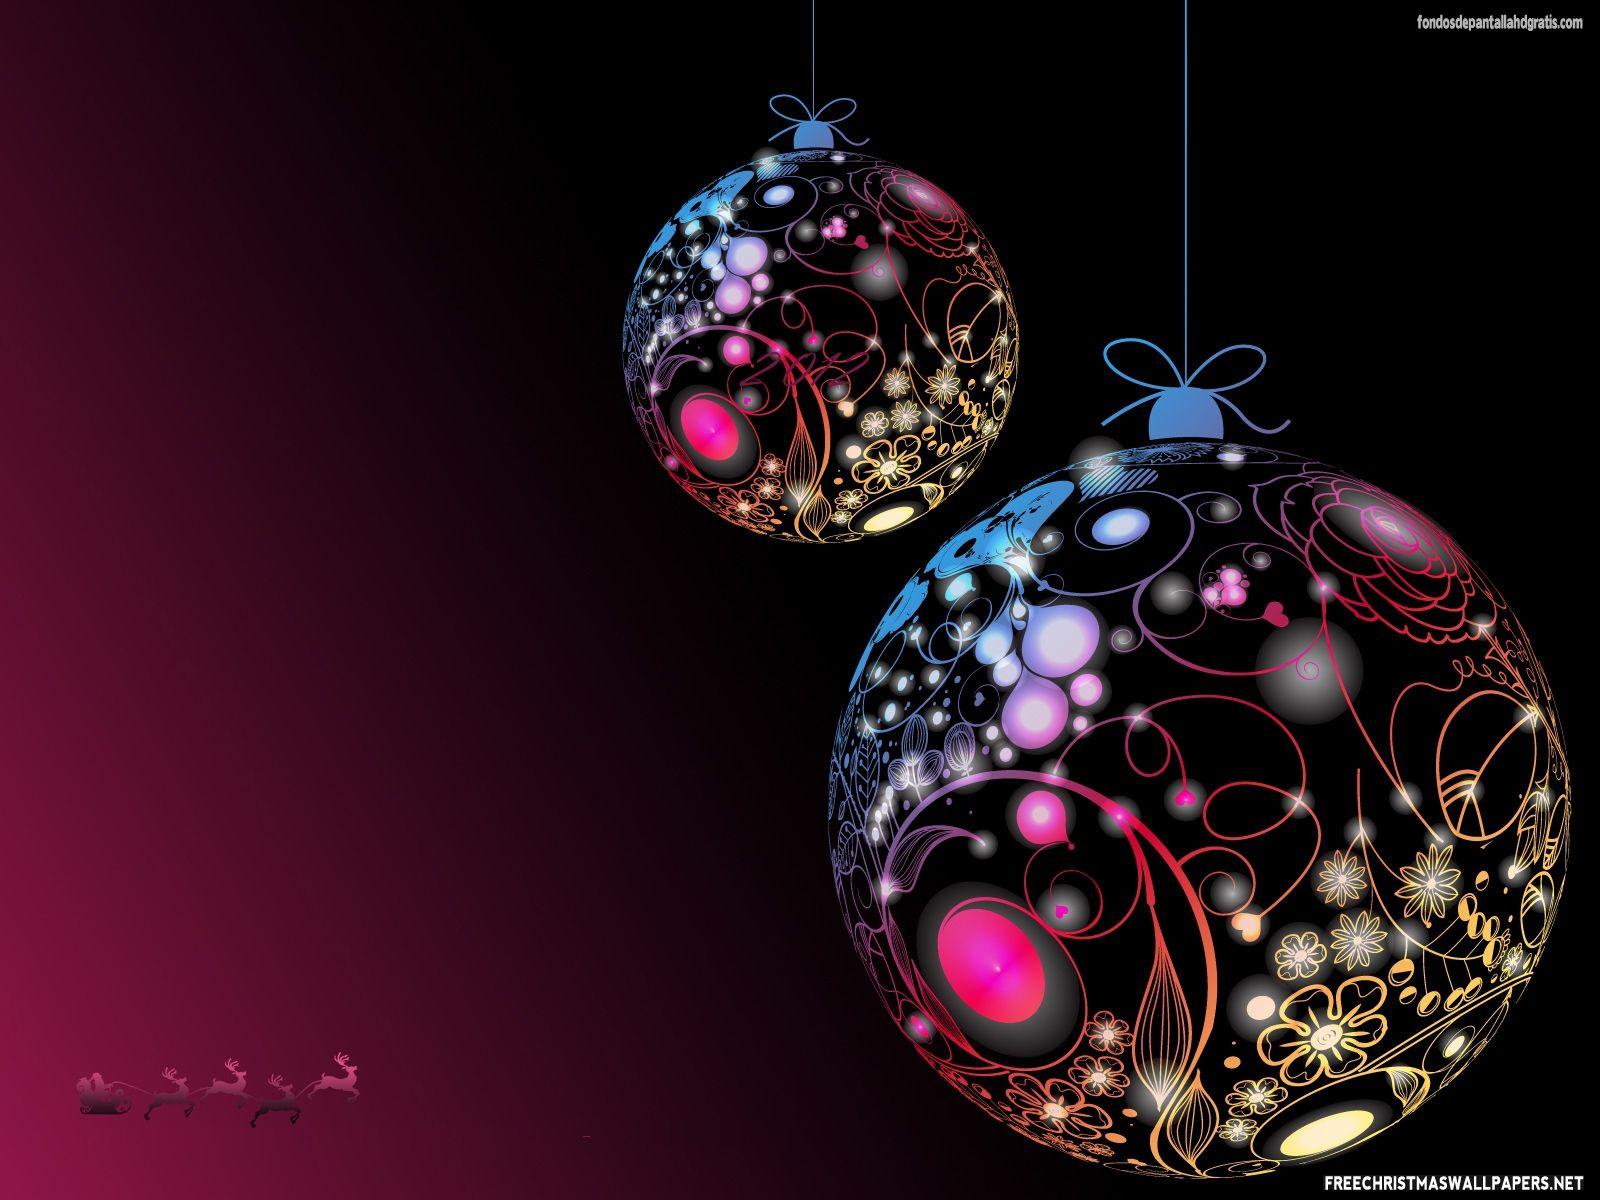 Fondos De Pantalla De Navidad: Fondos De Navidad 1920X1080 Para Bajar Al Celular 10 HD